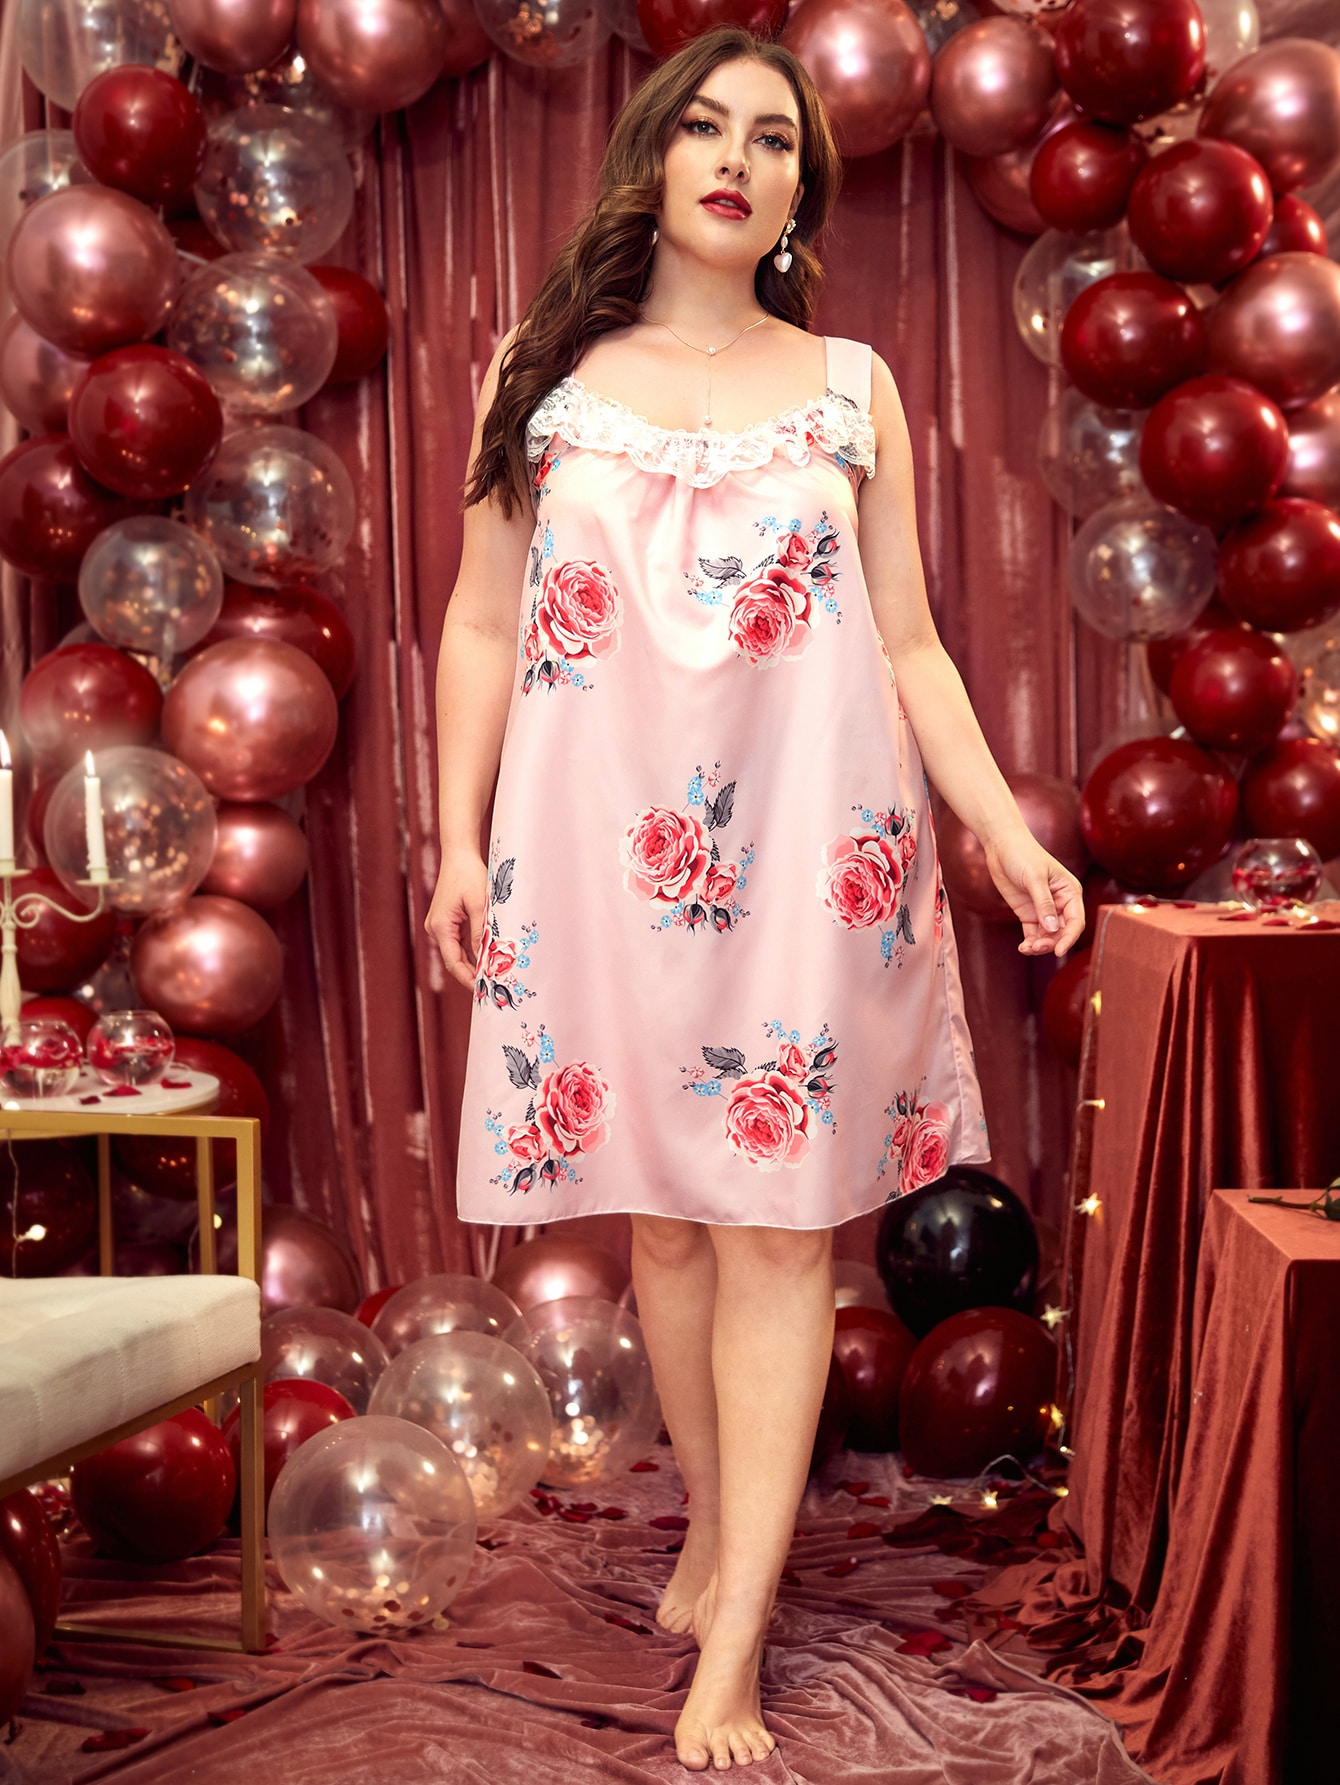 Plus Contrast Lace Floral Print Satin Night Dress